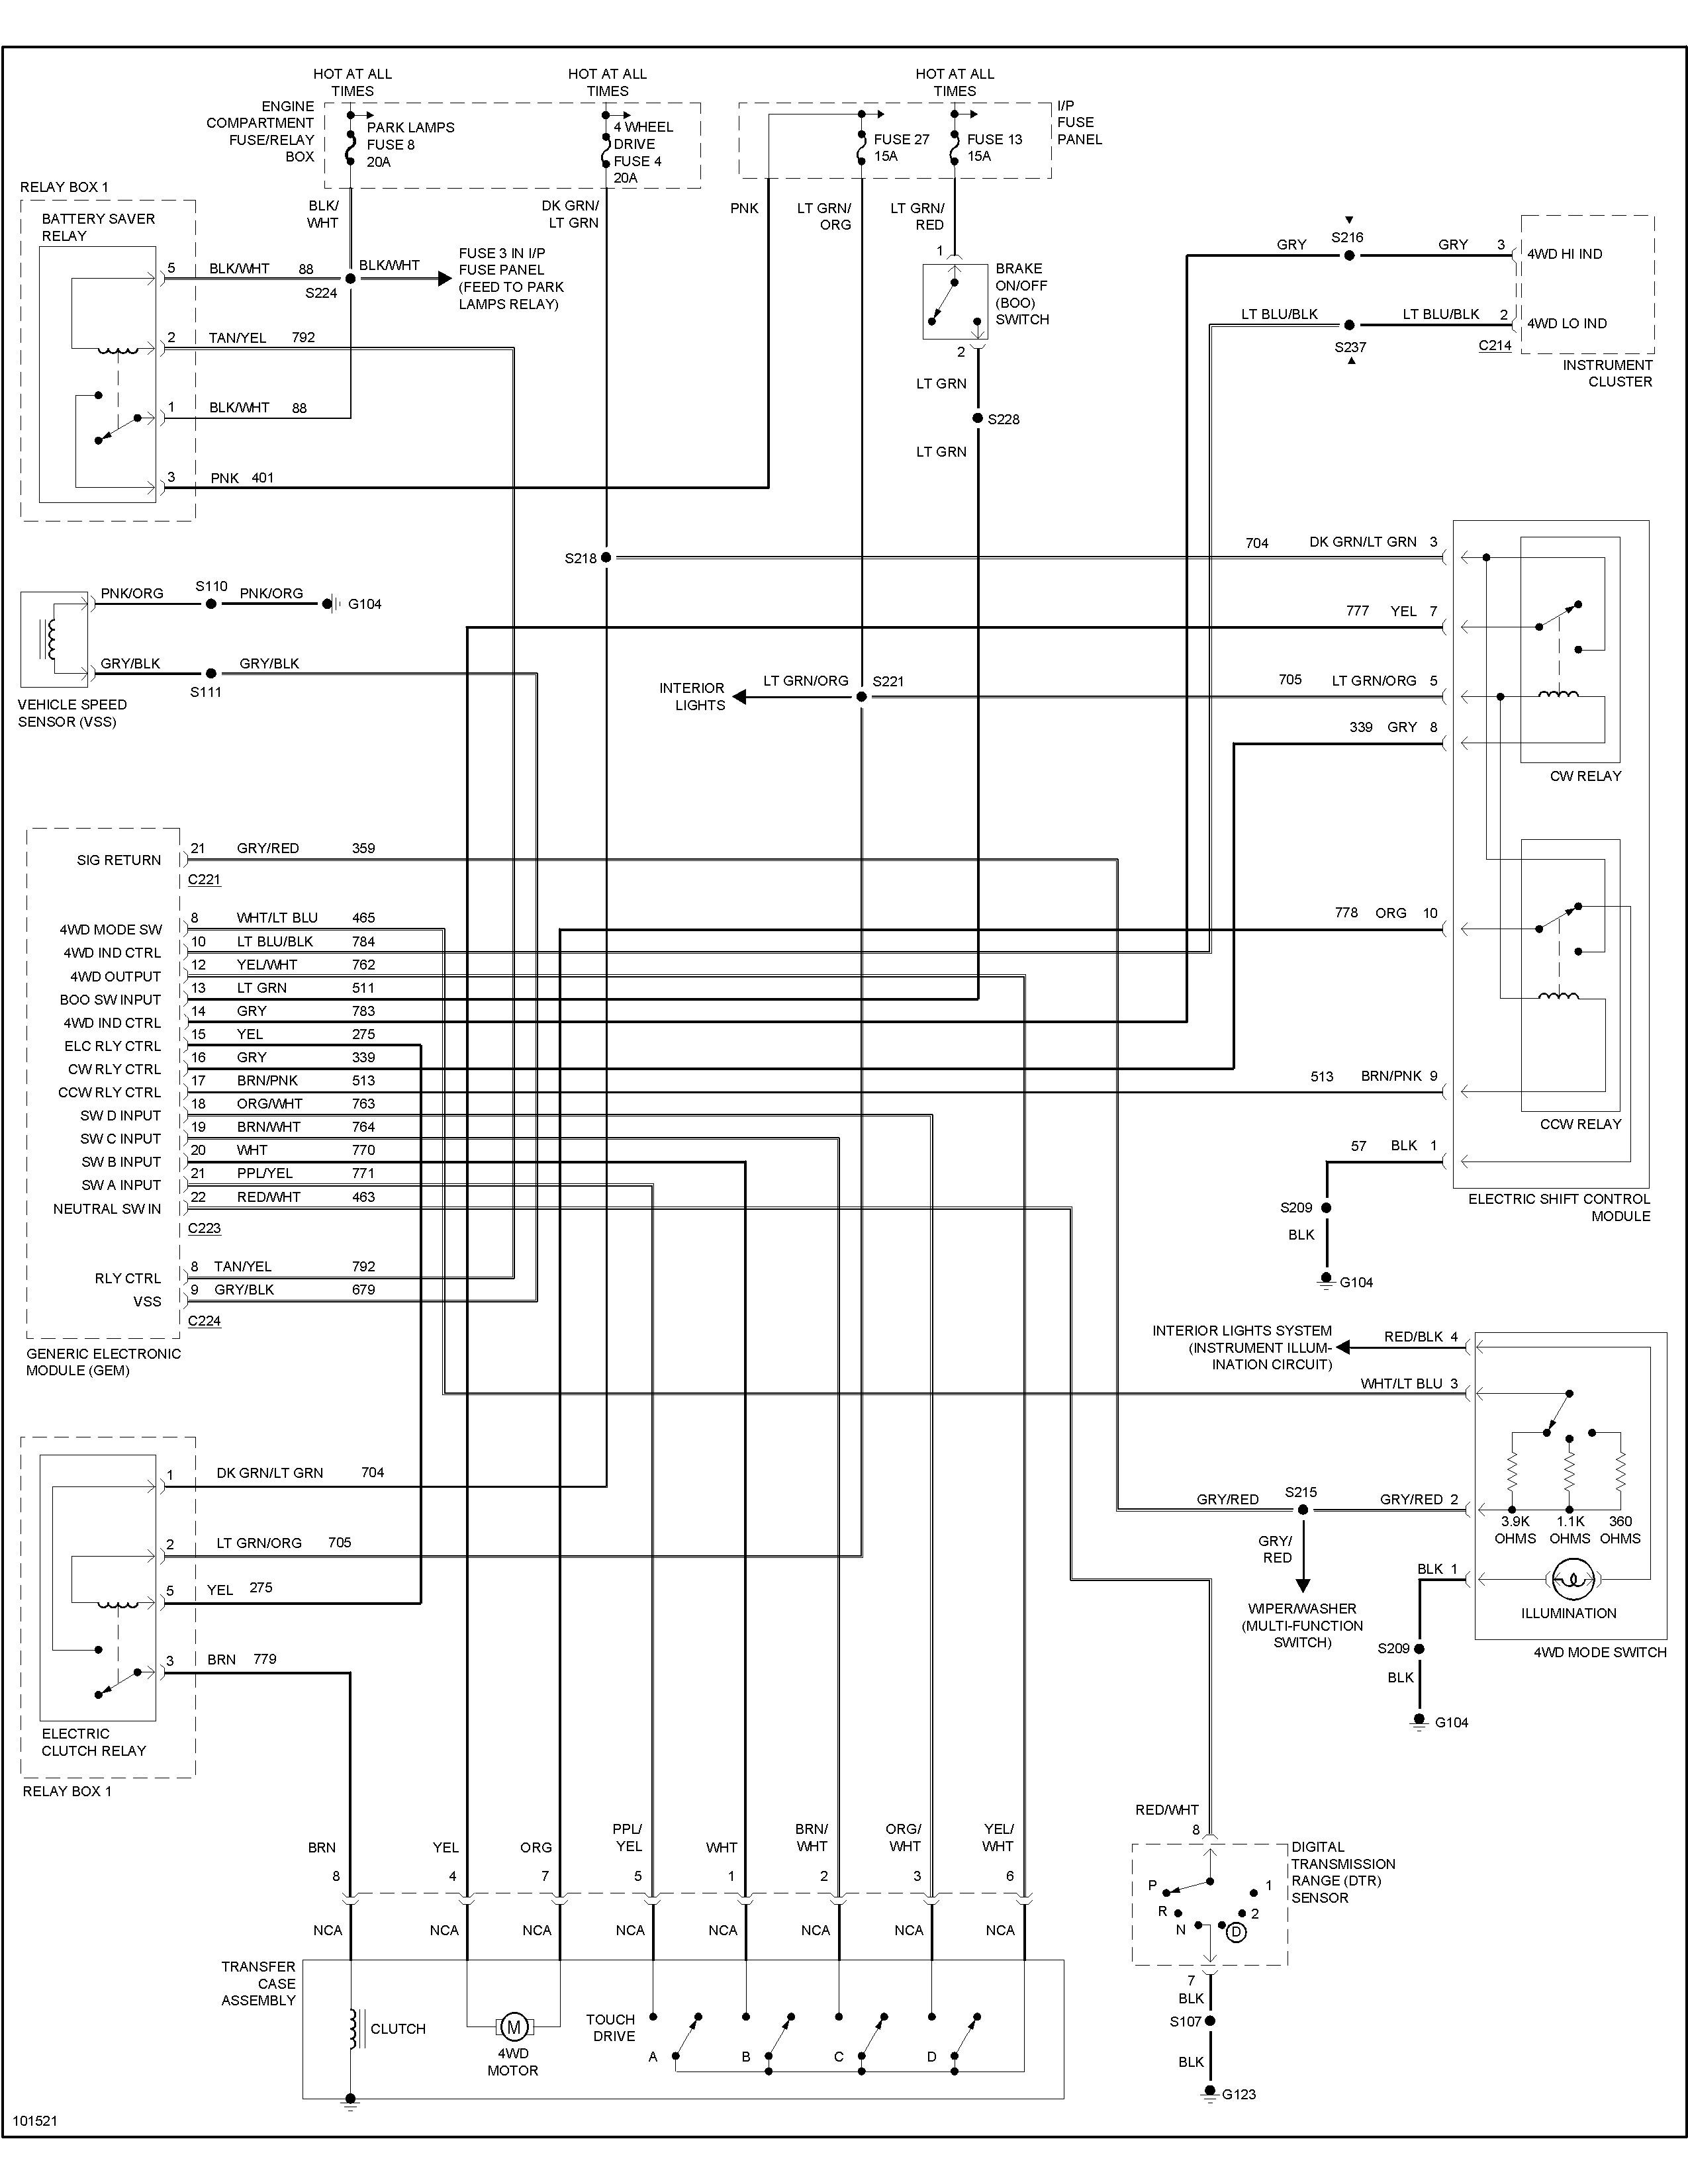 2005 ford Explorer 4×4 Wiring Diagram 94 F150 Transfer Case Wiring Diagram Wiring Diagram Of 2005 ford Explorer 4×4 Wiring Diagram